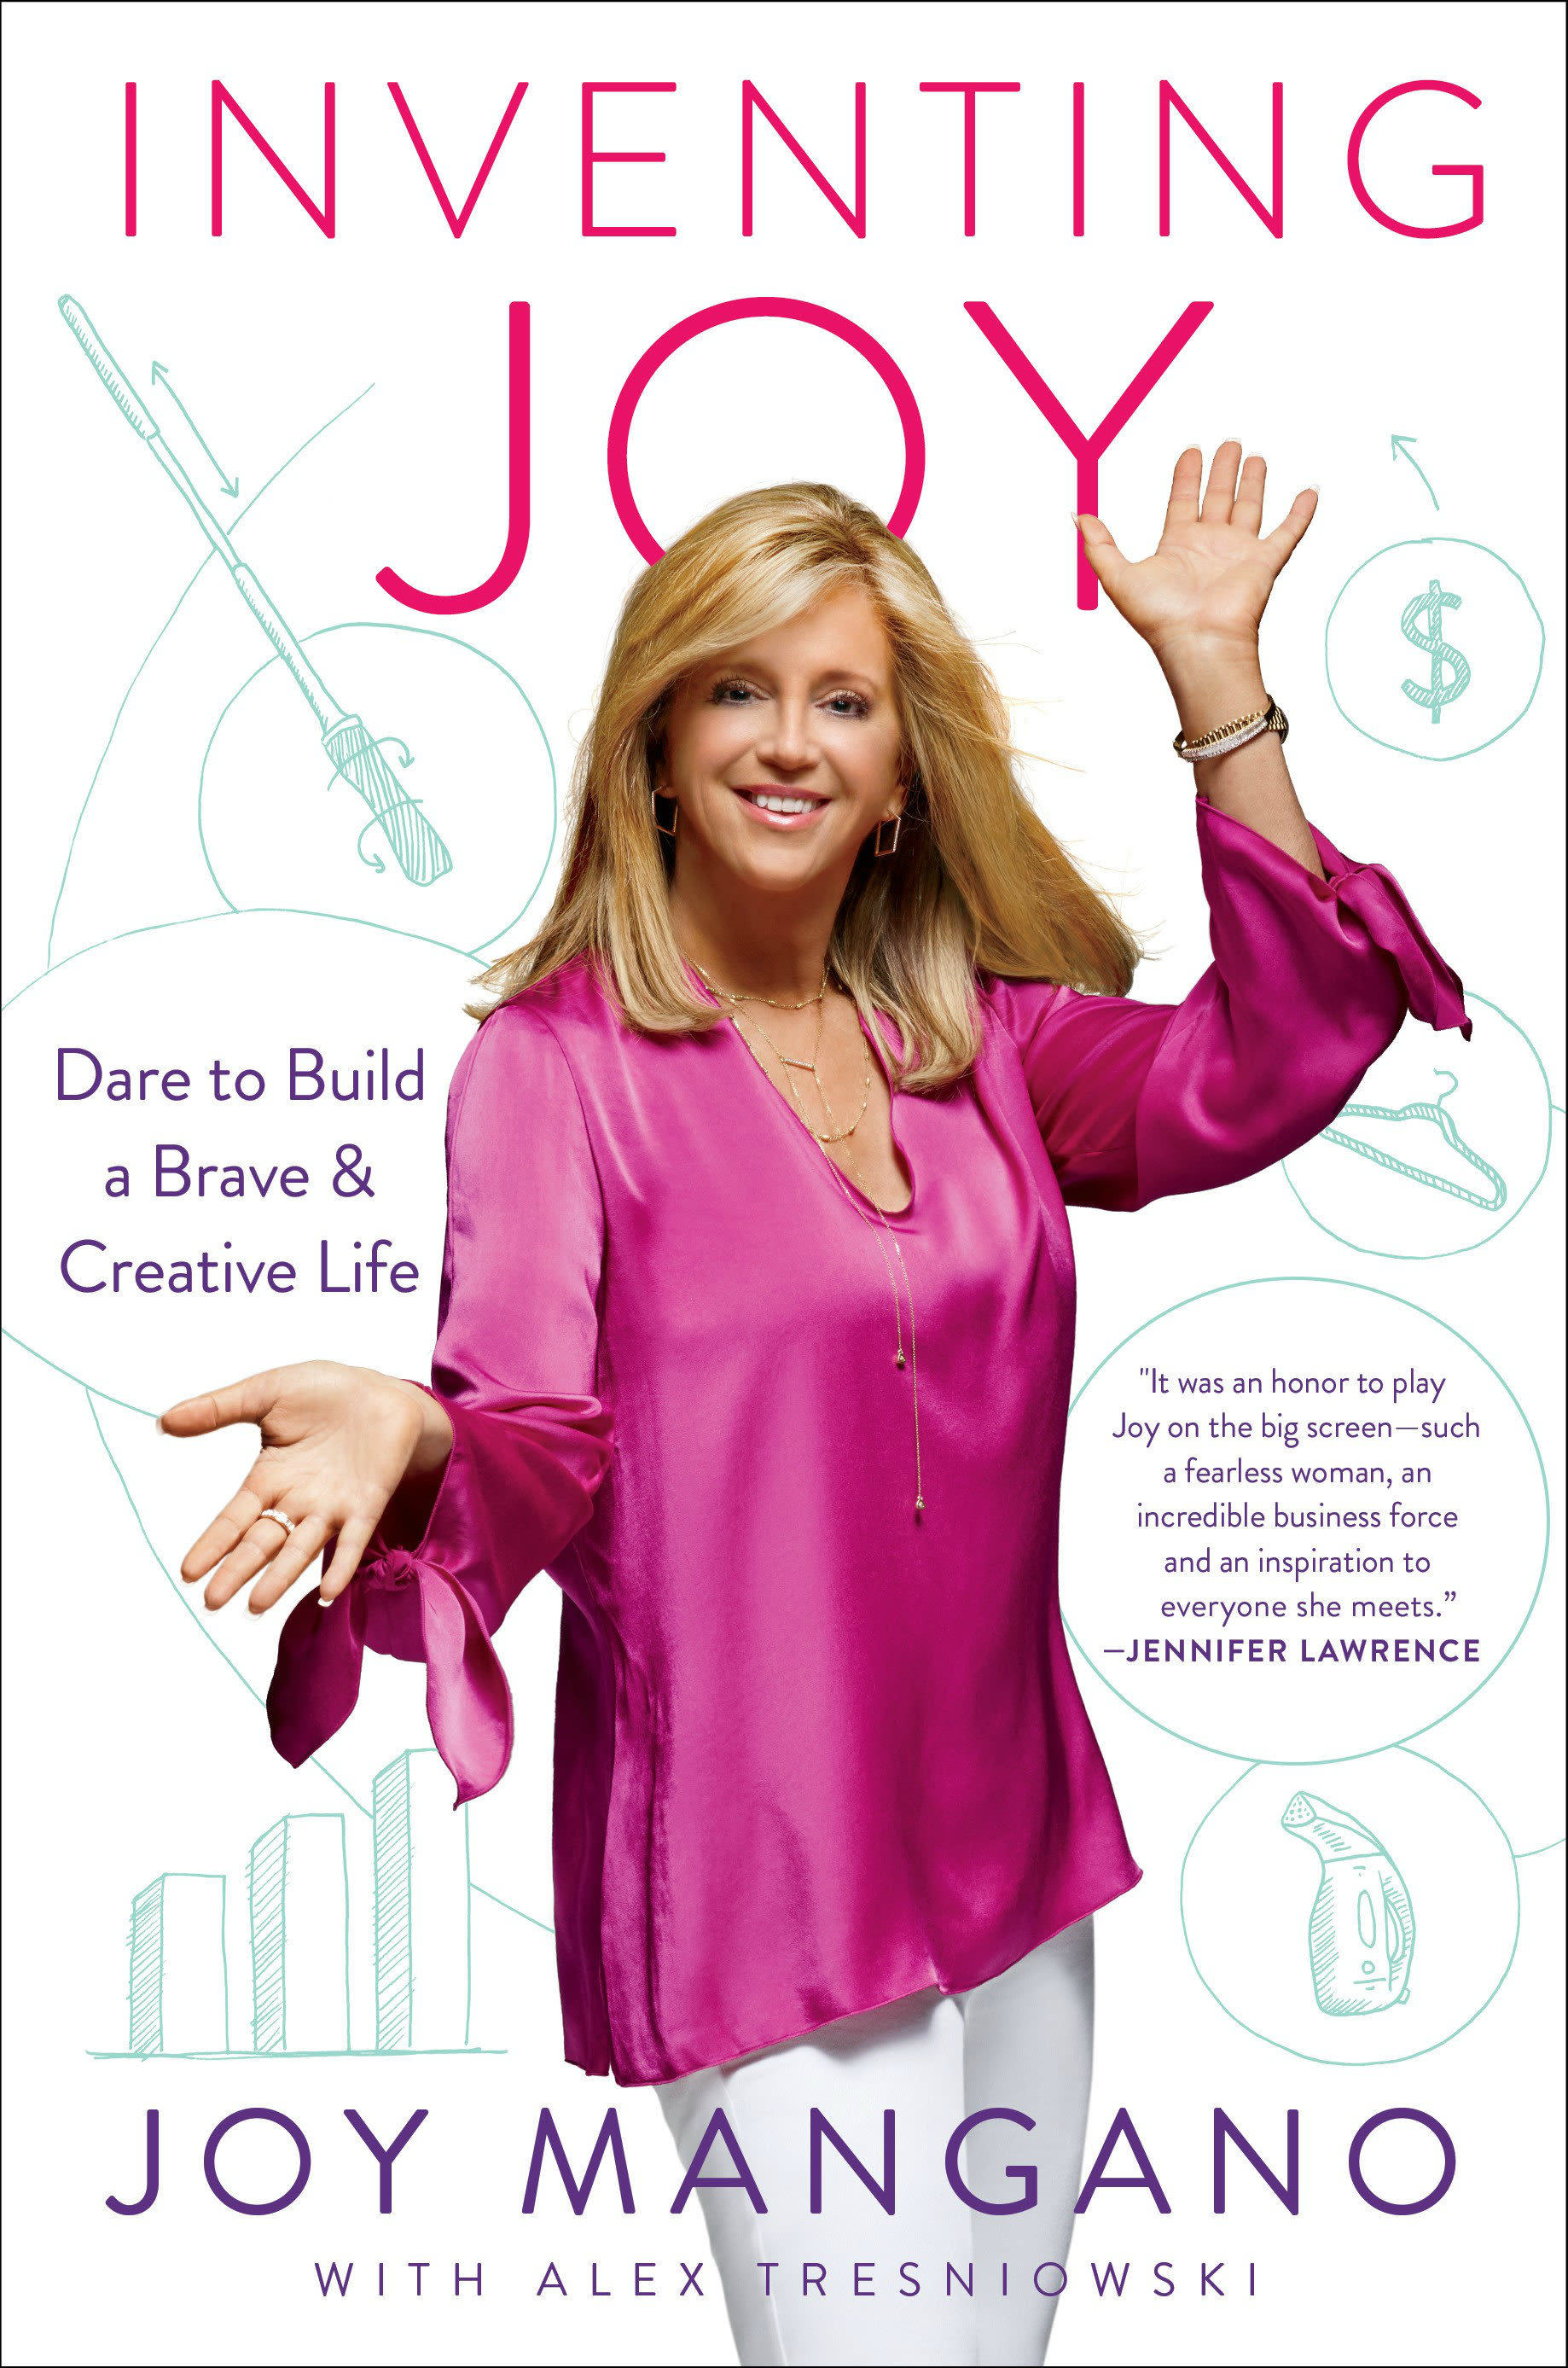 inventing joy book cover